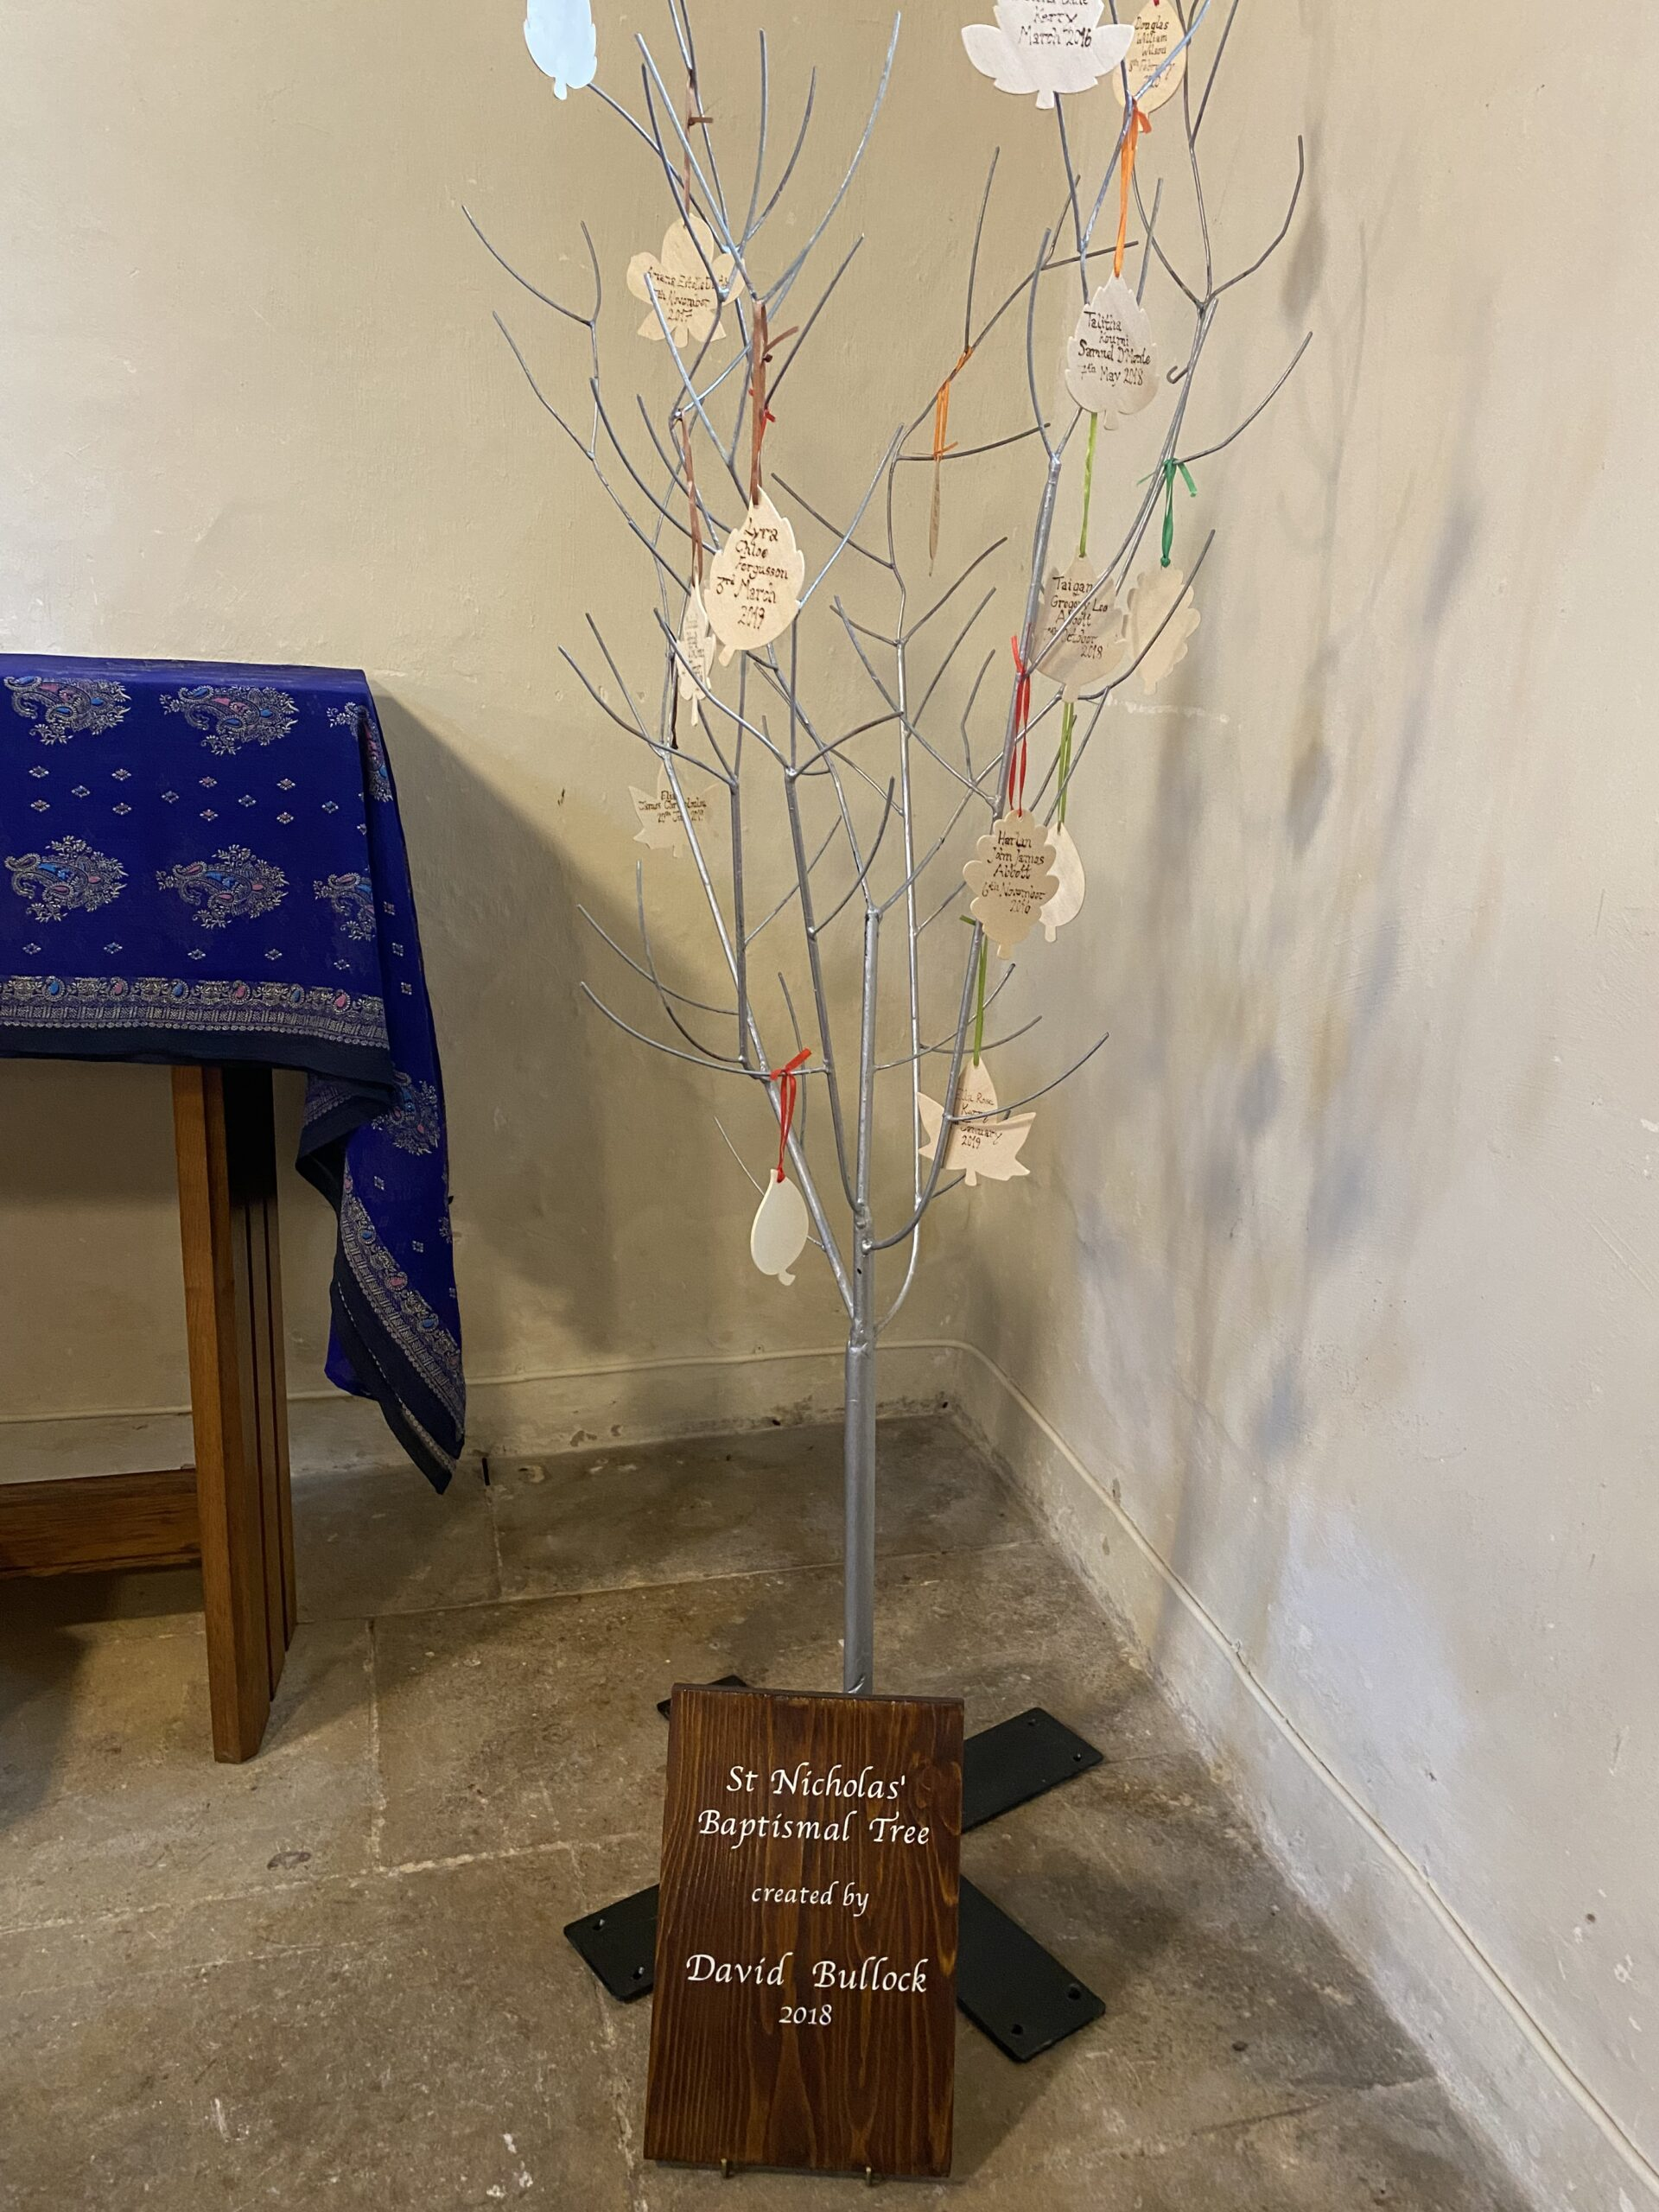 Baptismal Tree at St Nicholas Church